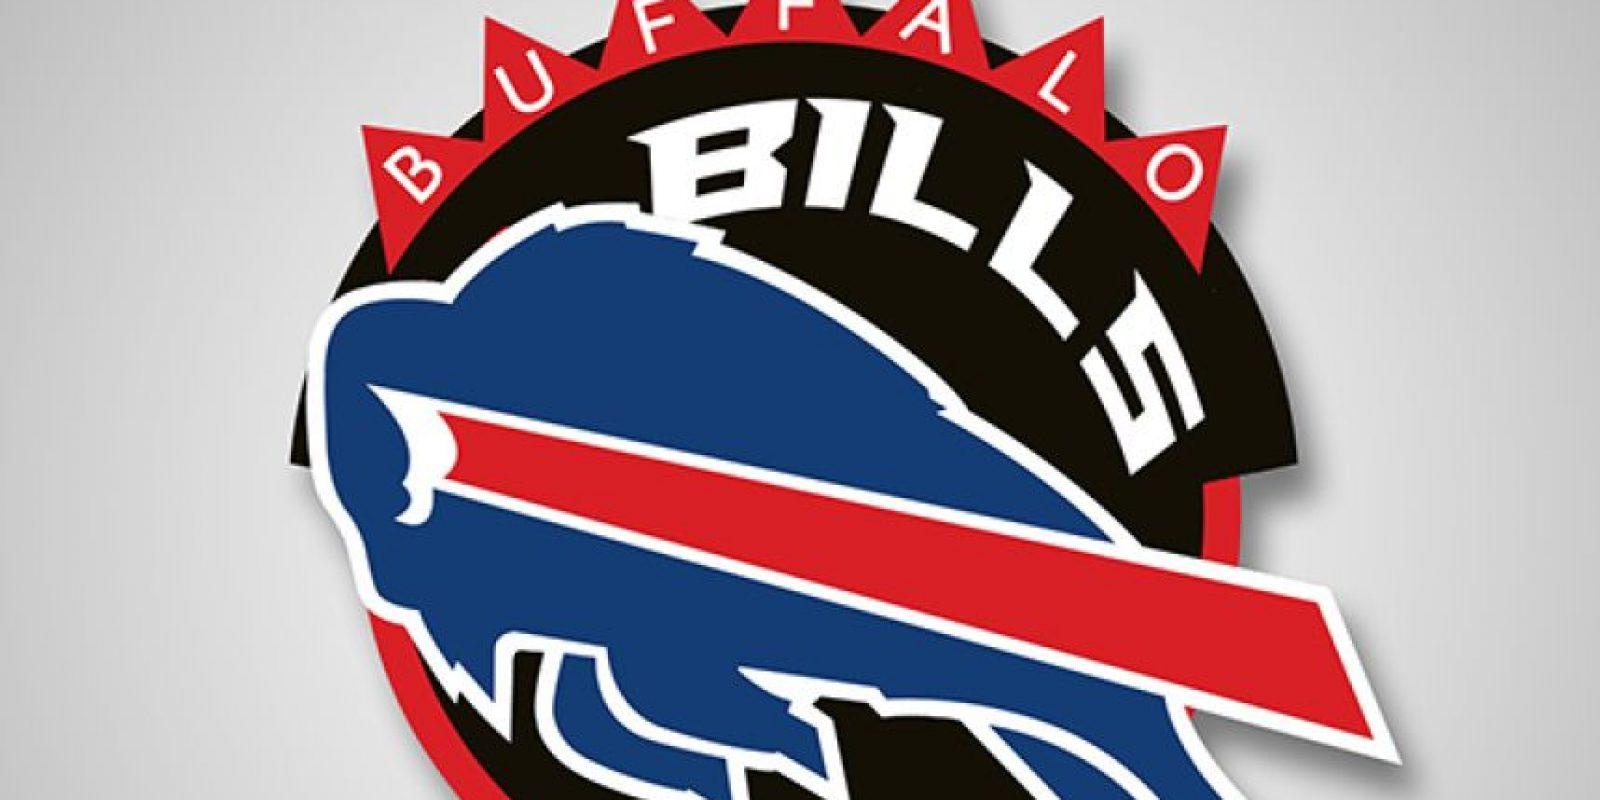 Buffalo Bills y Toronto Raptors Foto:DaylySnark